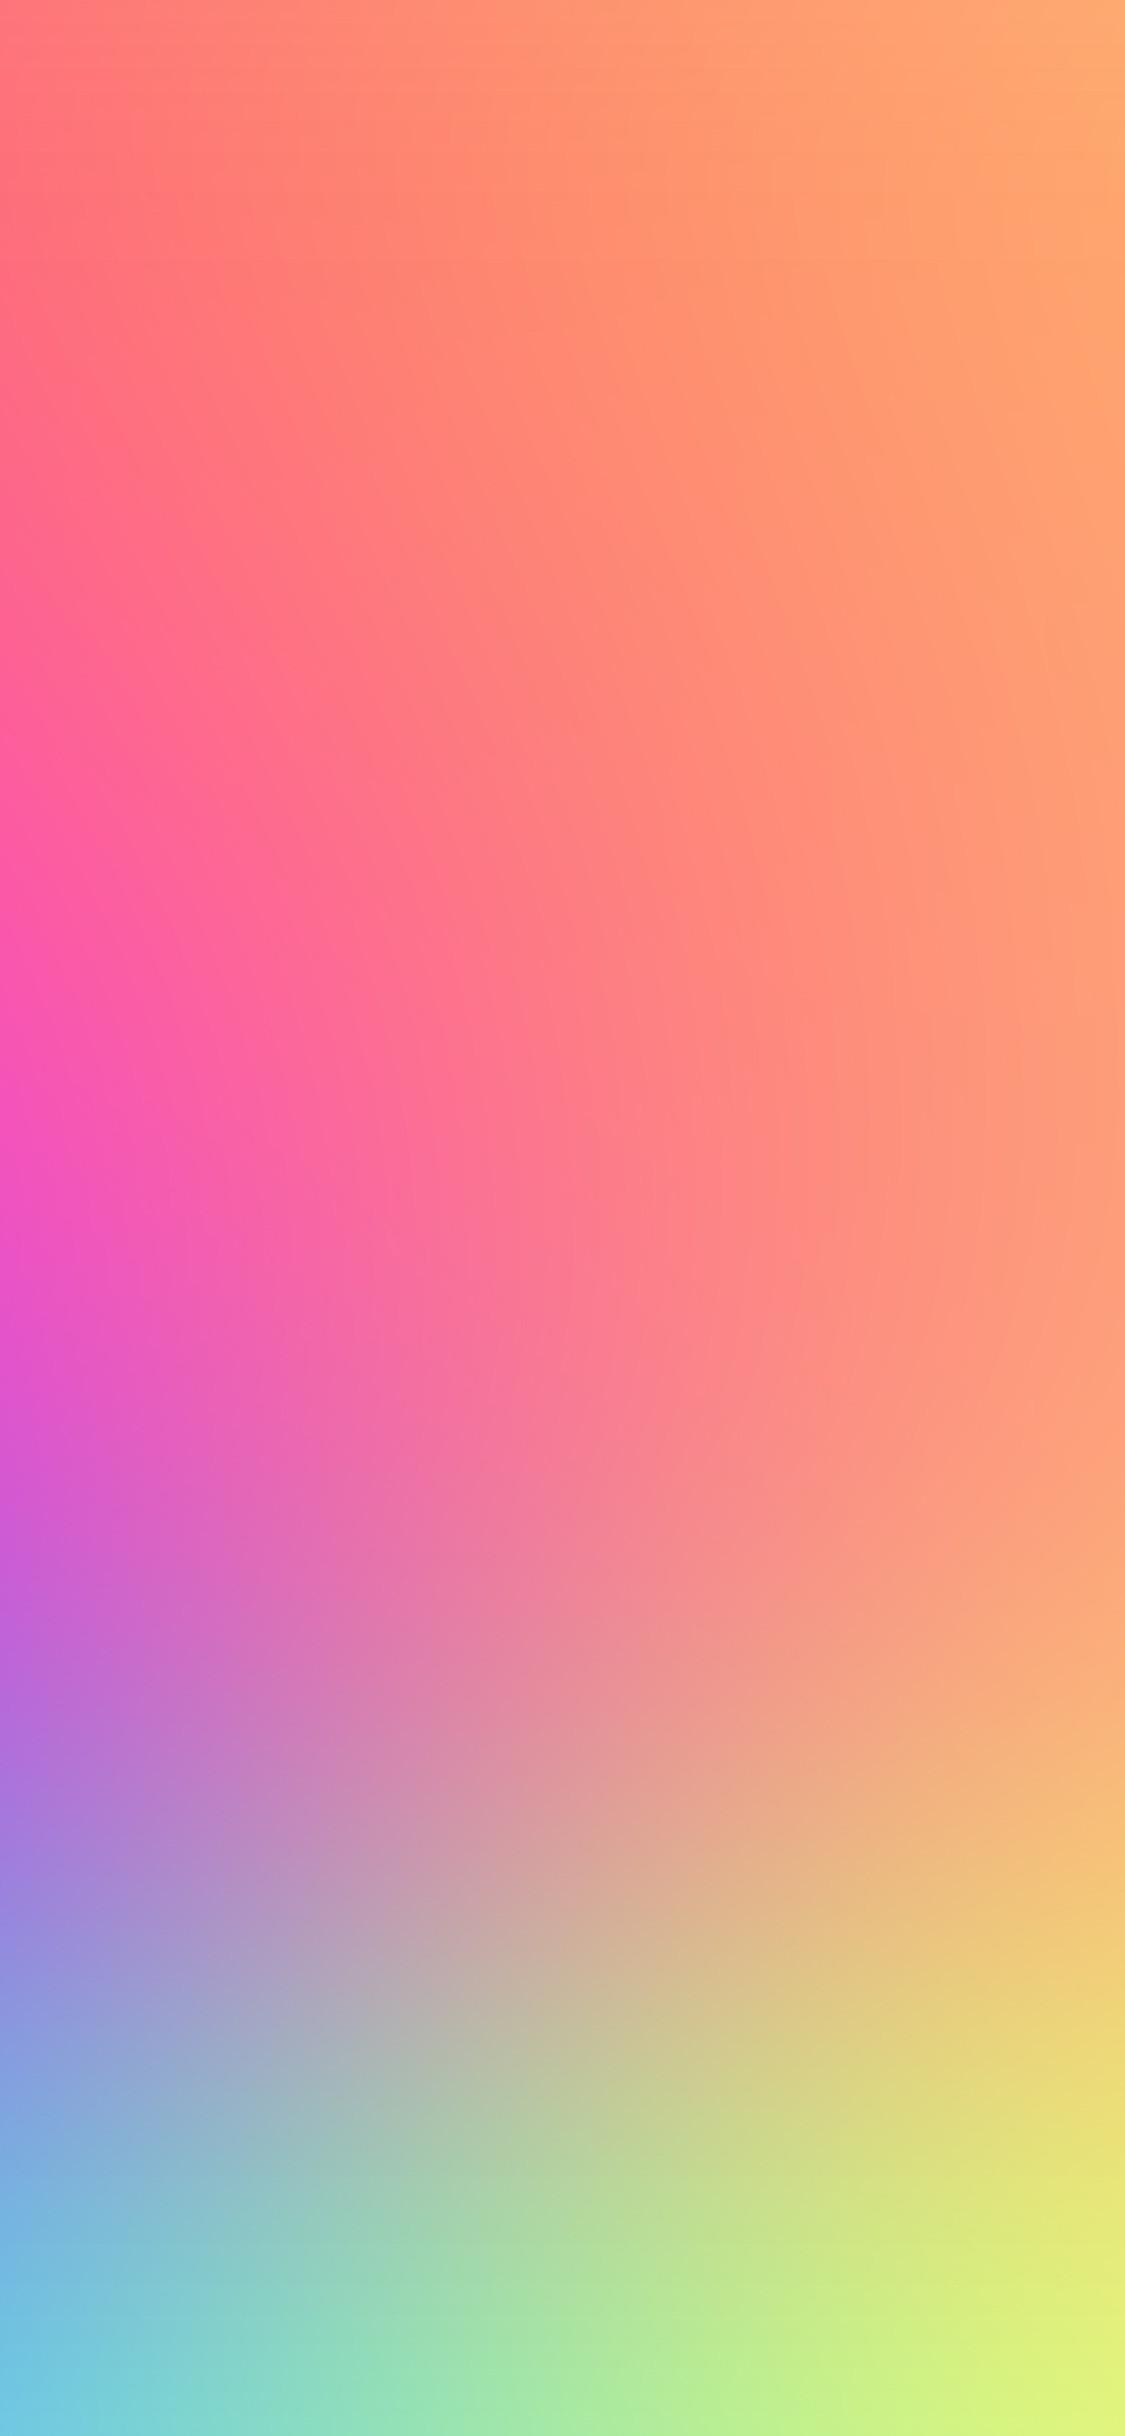 858056 full size soft color wallpaper